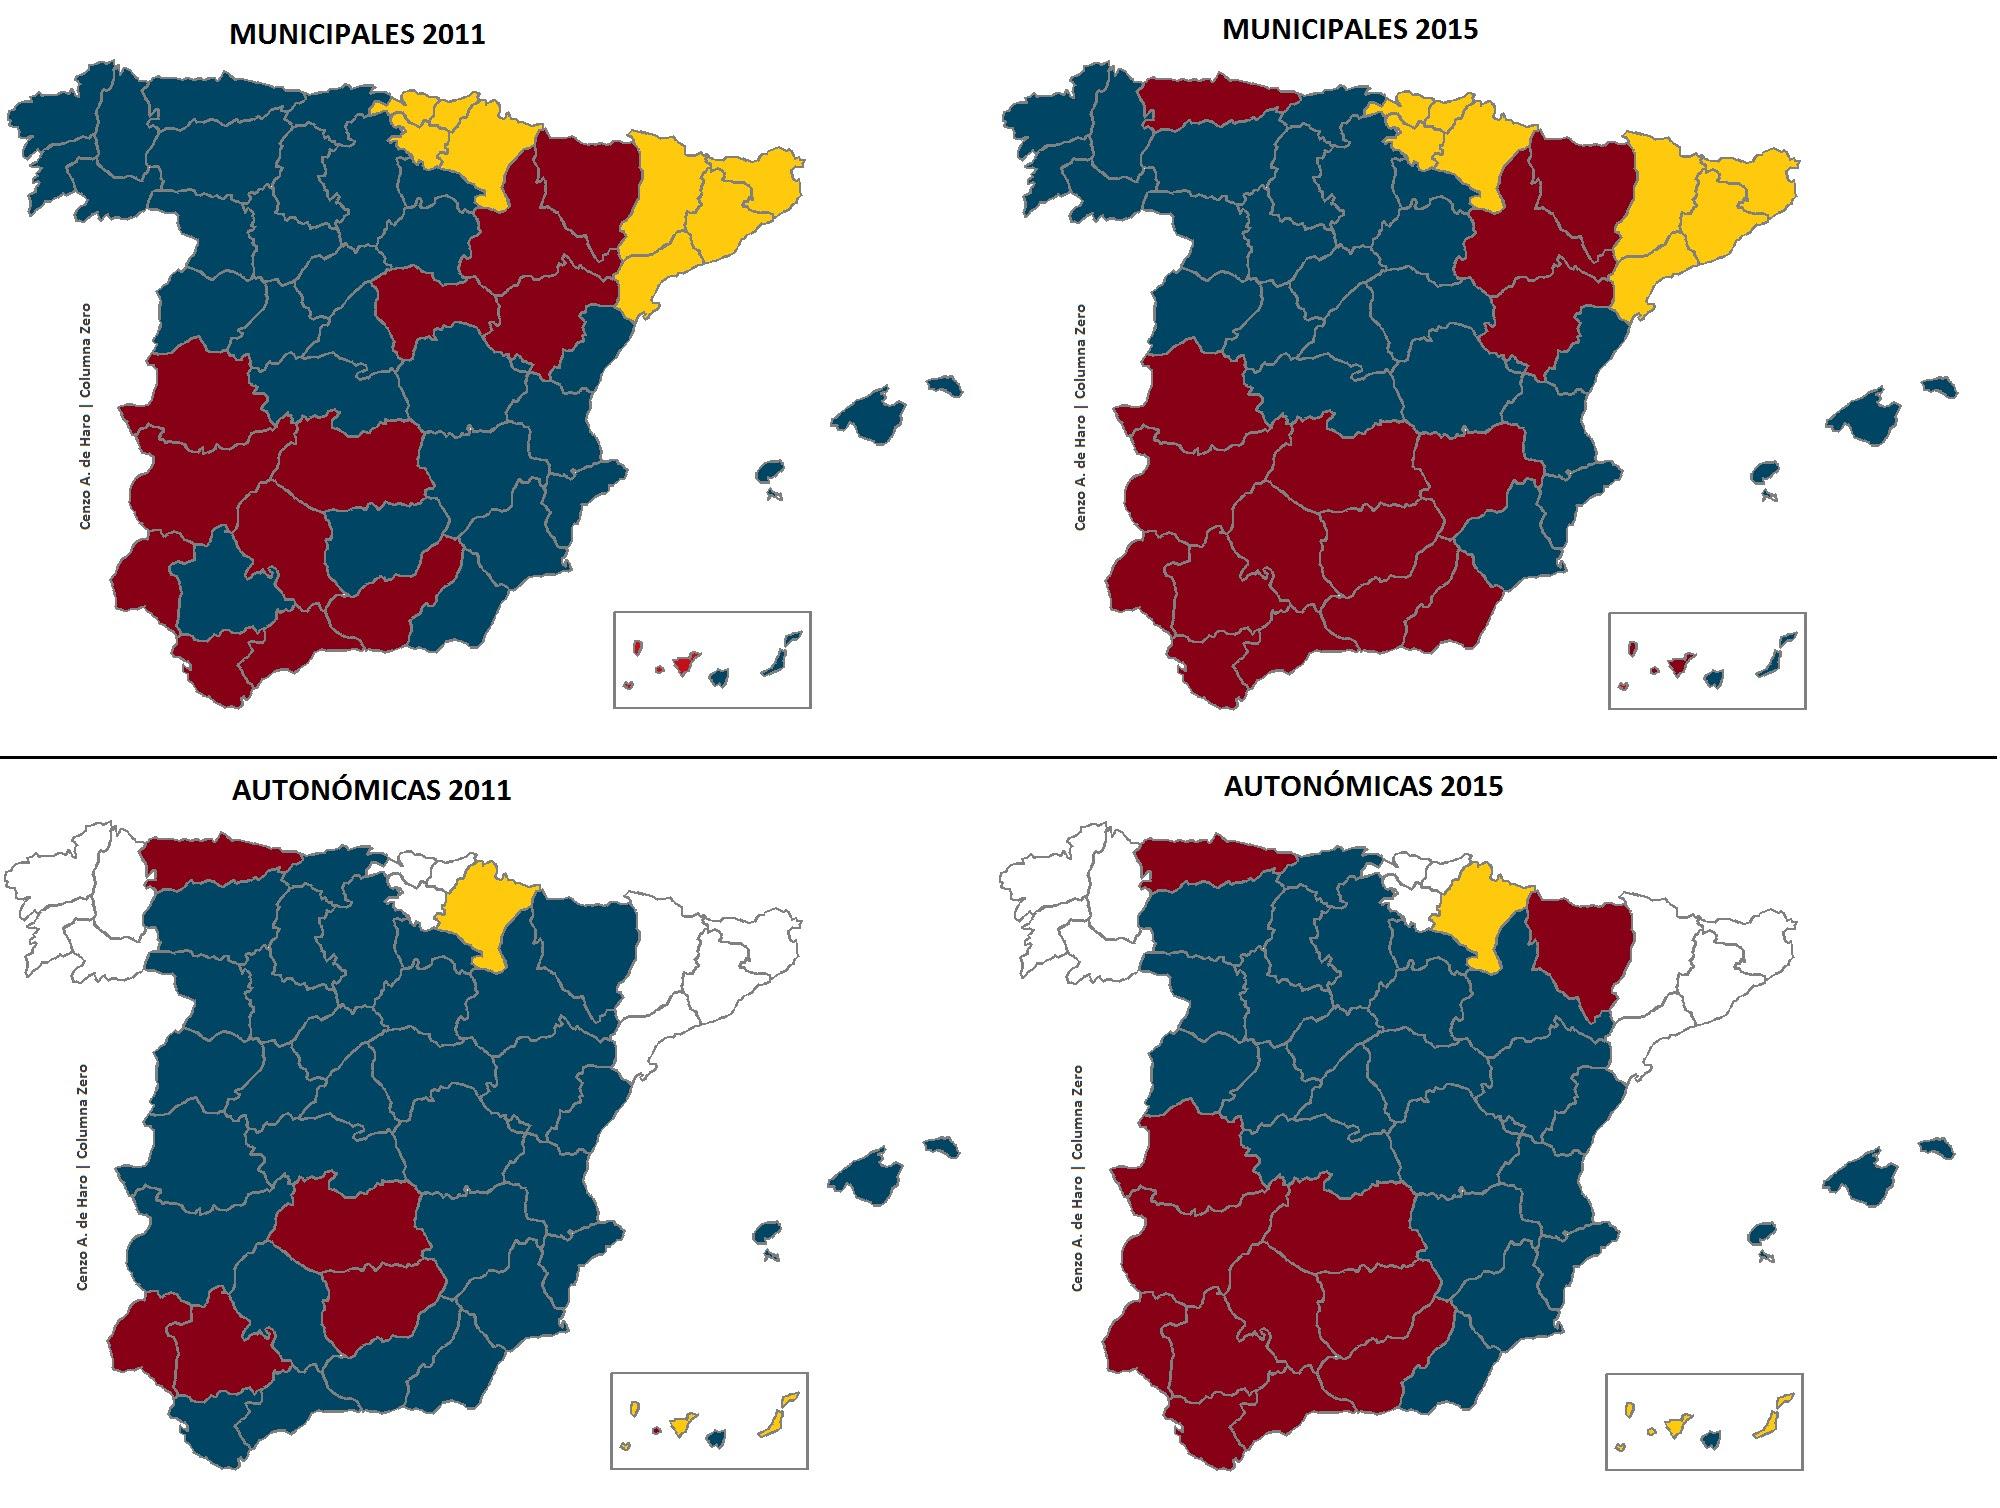 Mapa De Elecciones 2015.Mapa De Elecciones 2015 Mapa